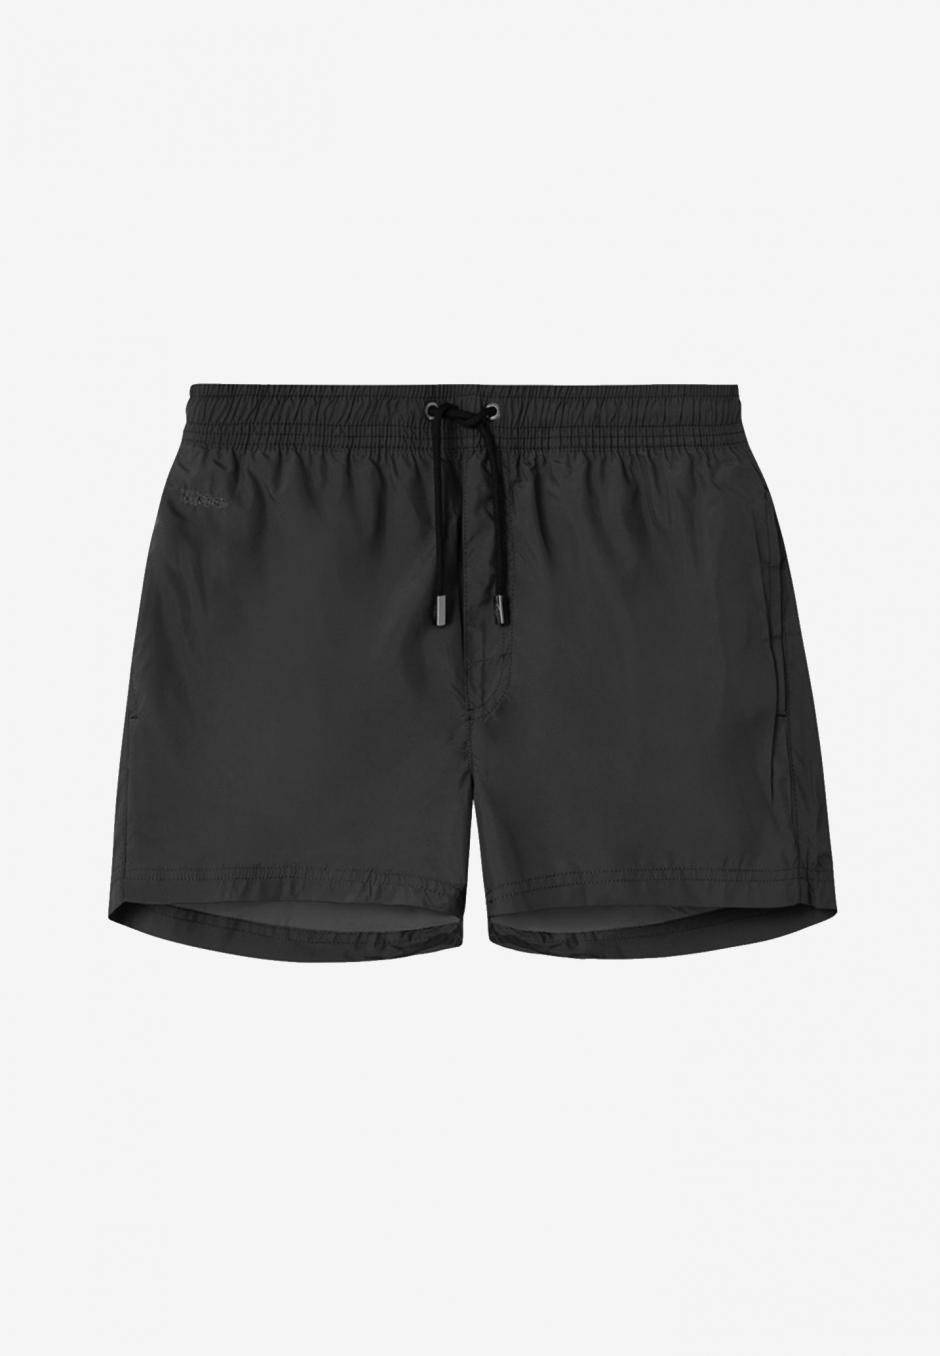 Nikben Plain Swimshorts Black